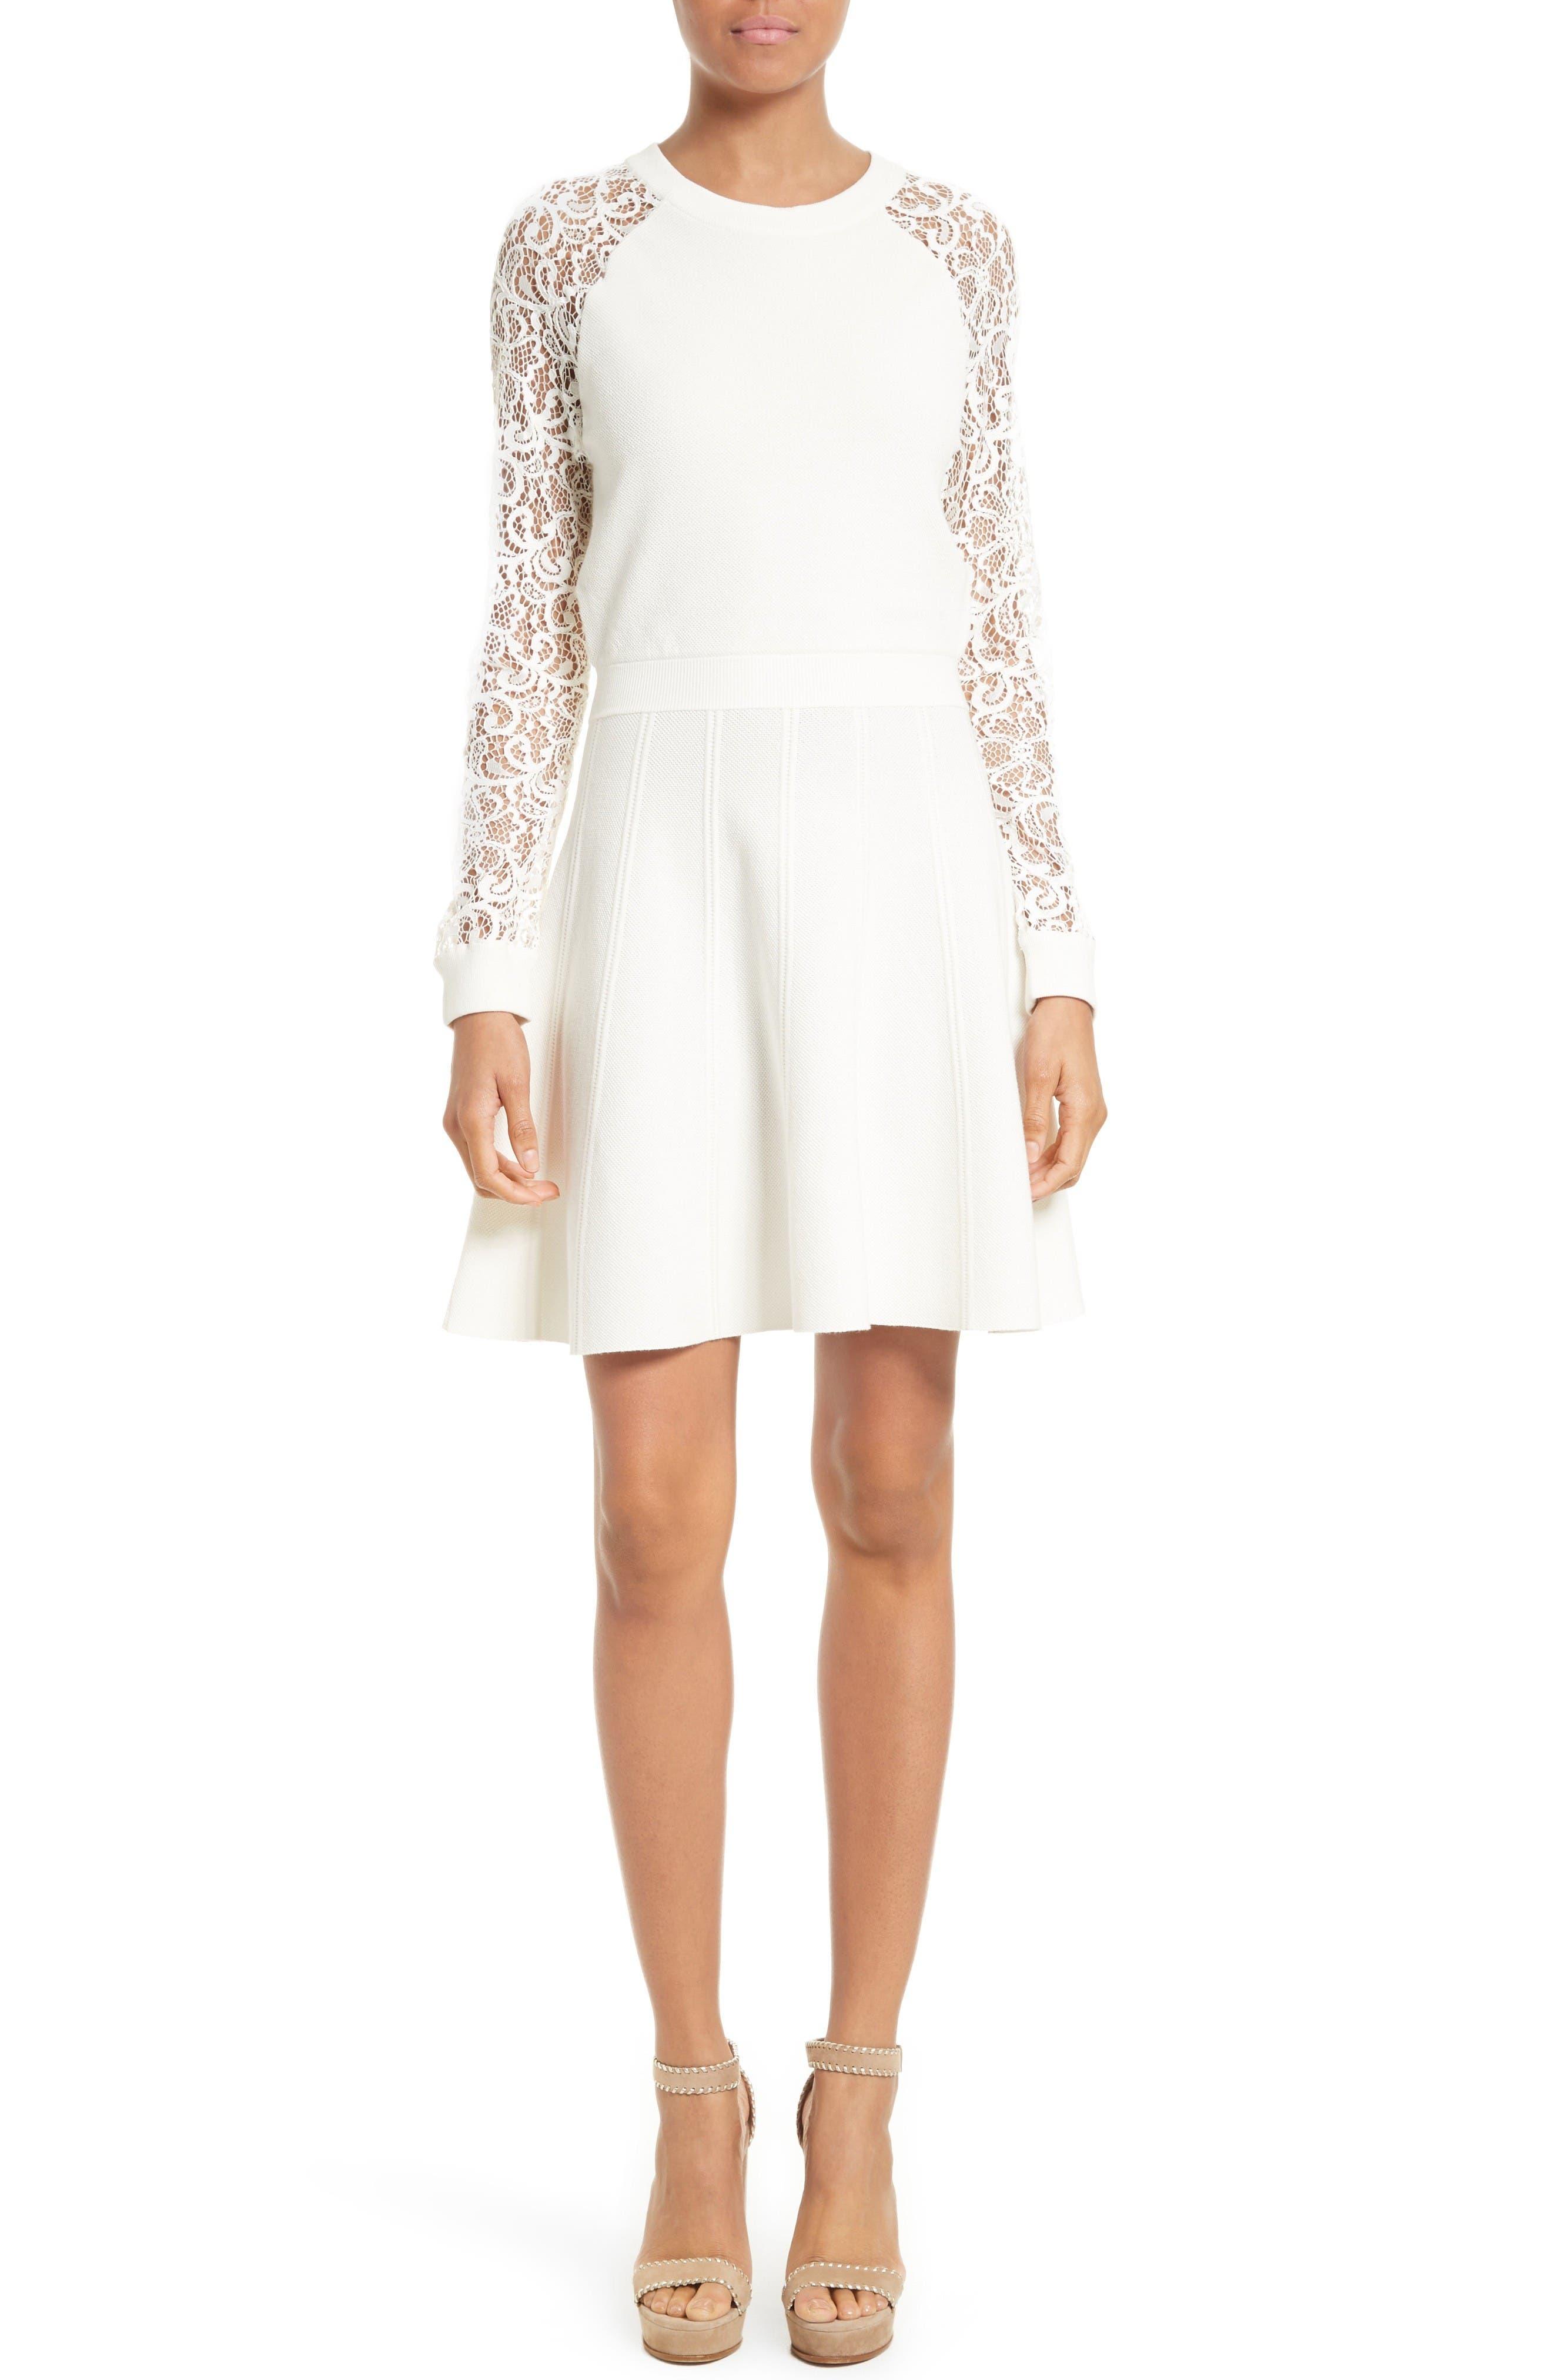 ALICE + OLIVIA Blake Lace Sleeve Sweater Dress